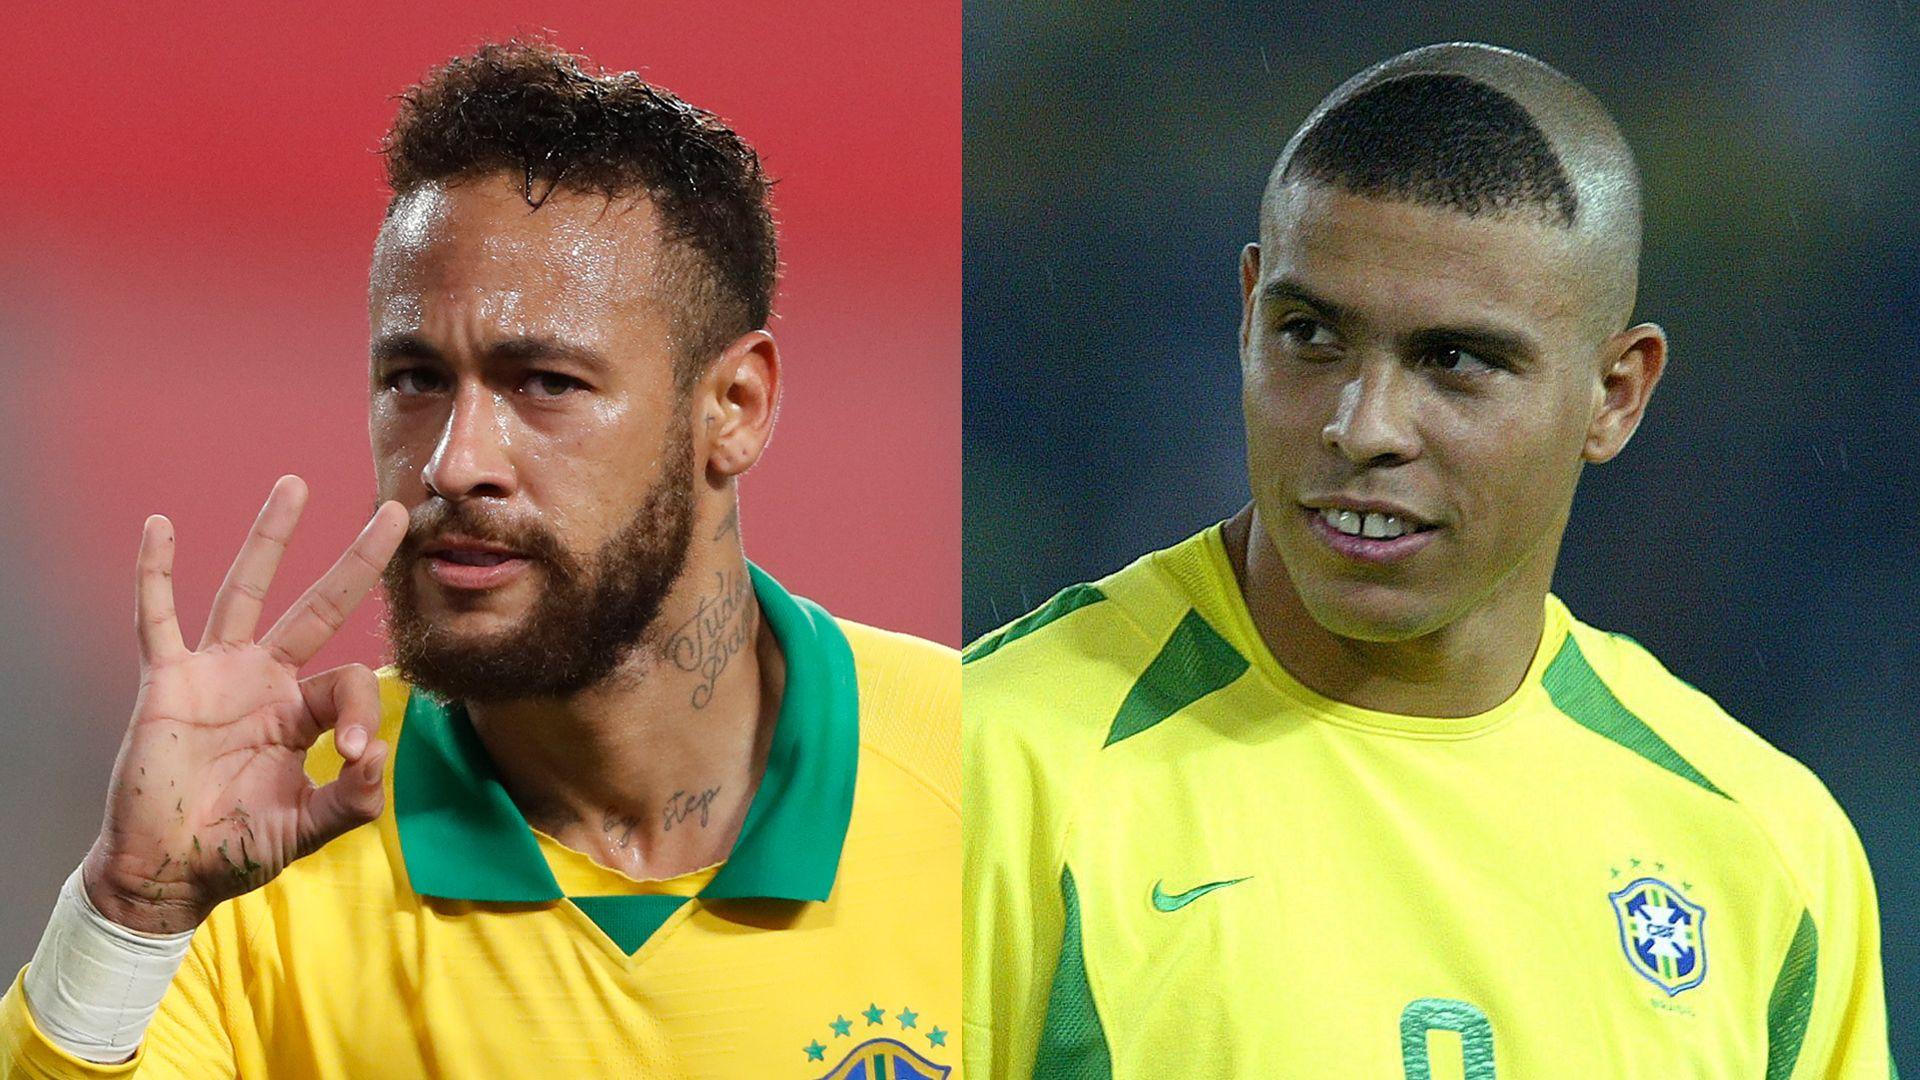 Neymar overtakes Ronaldo in Brazil win